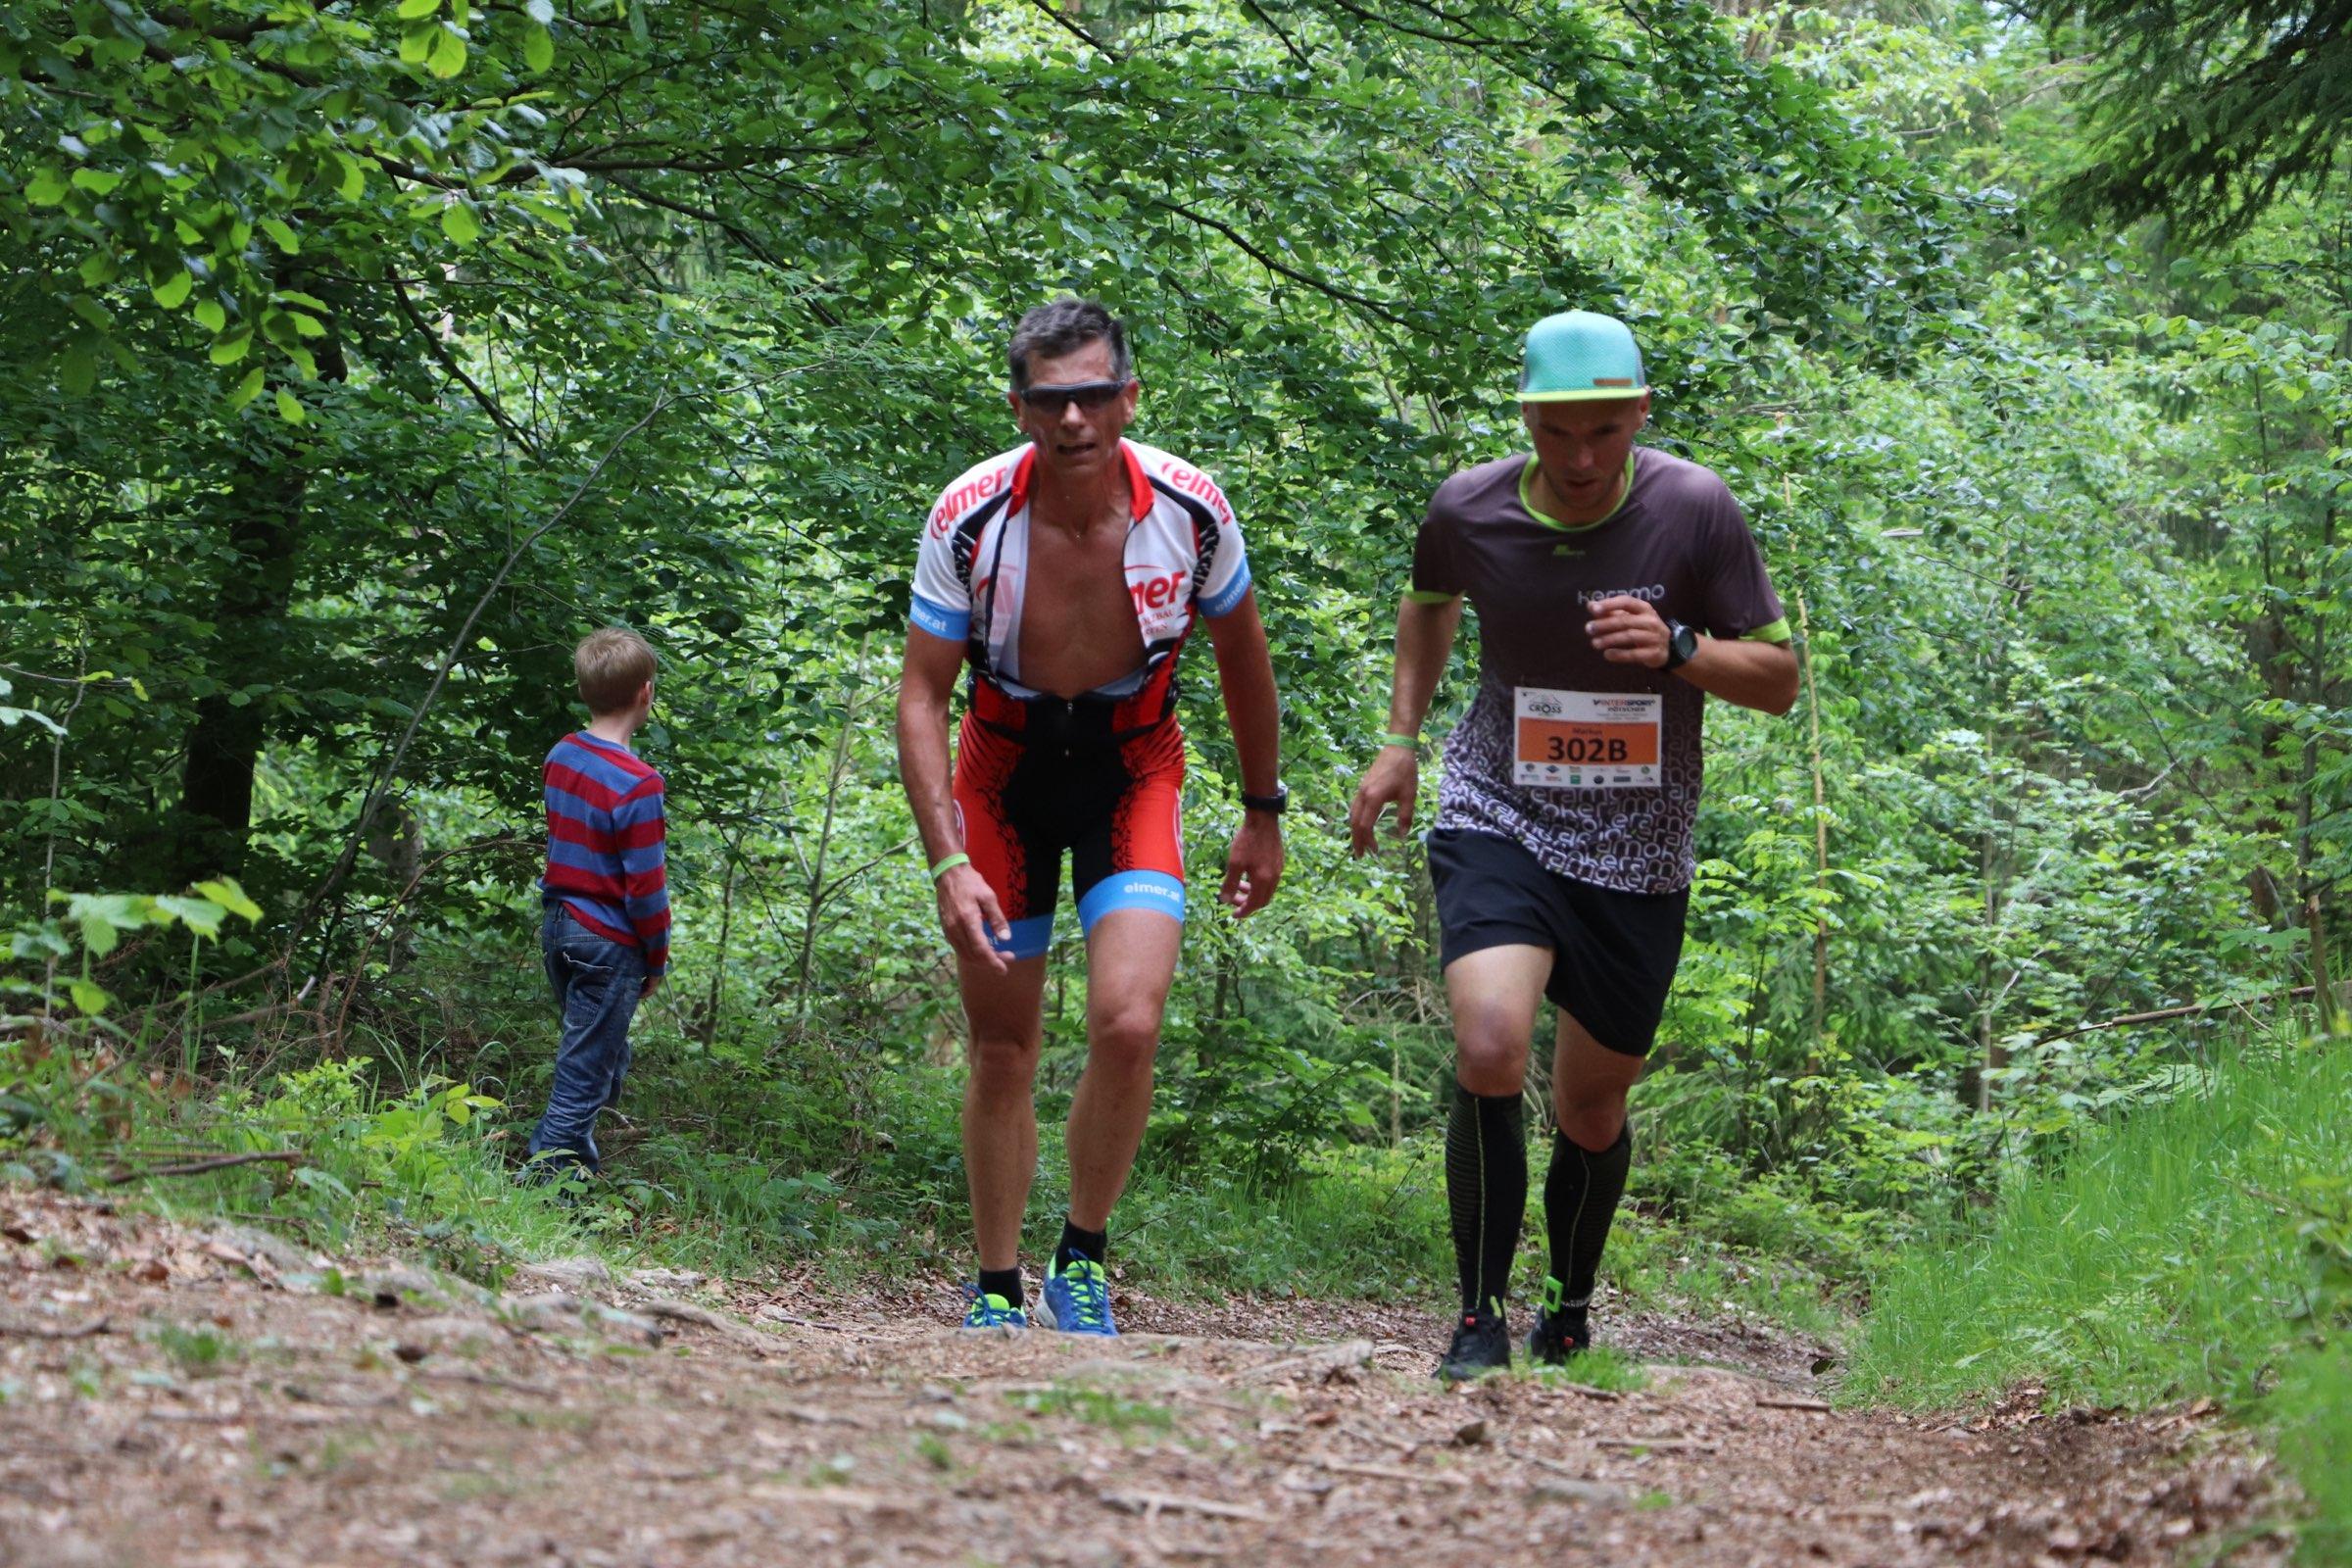 partner-Triathlon, Bike&Run, E-Bike Hansberg